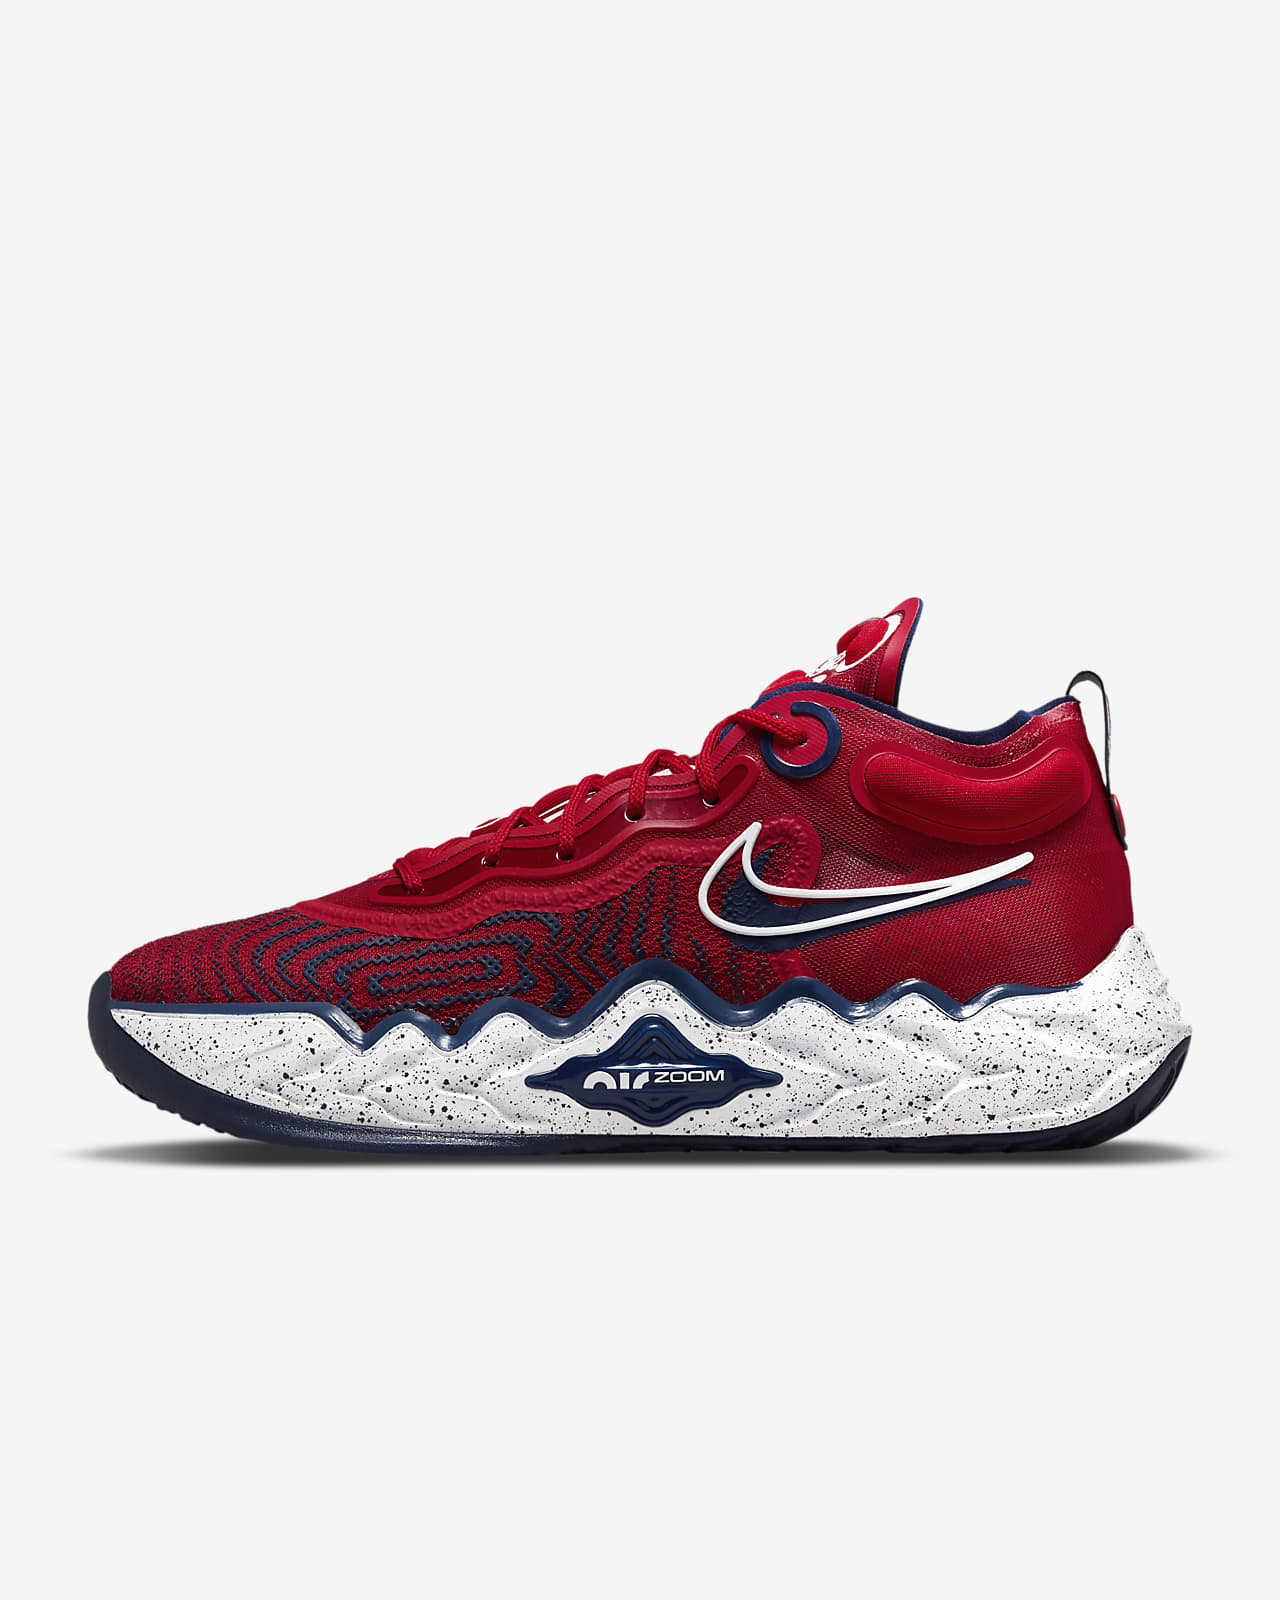 Баскетбольные кроссовки Nike Air Zoom G.T.Run